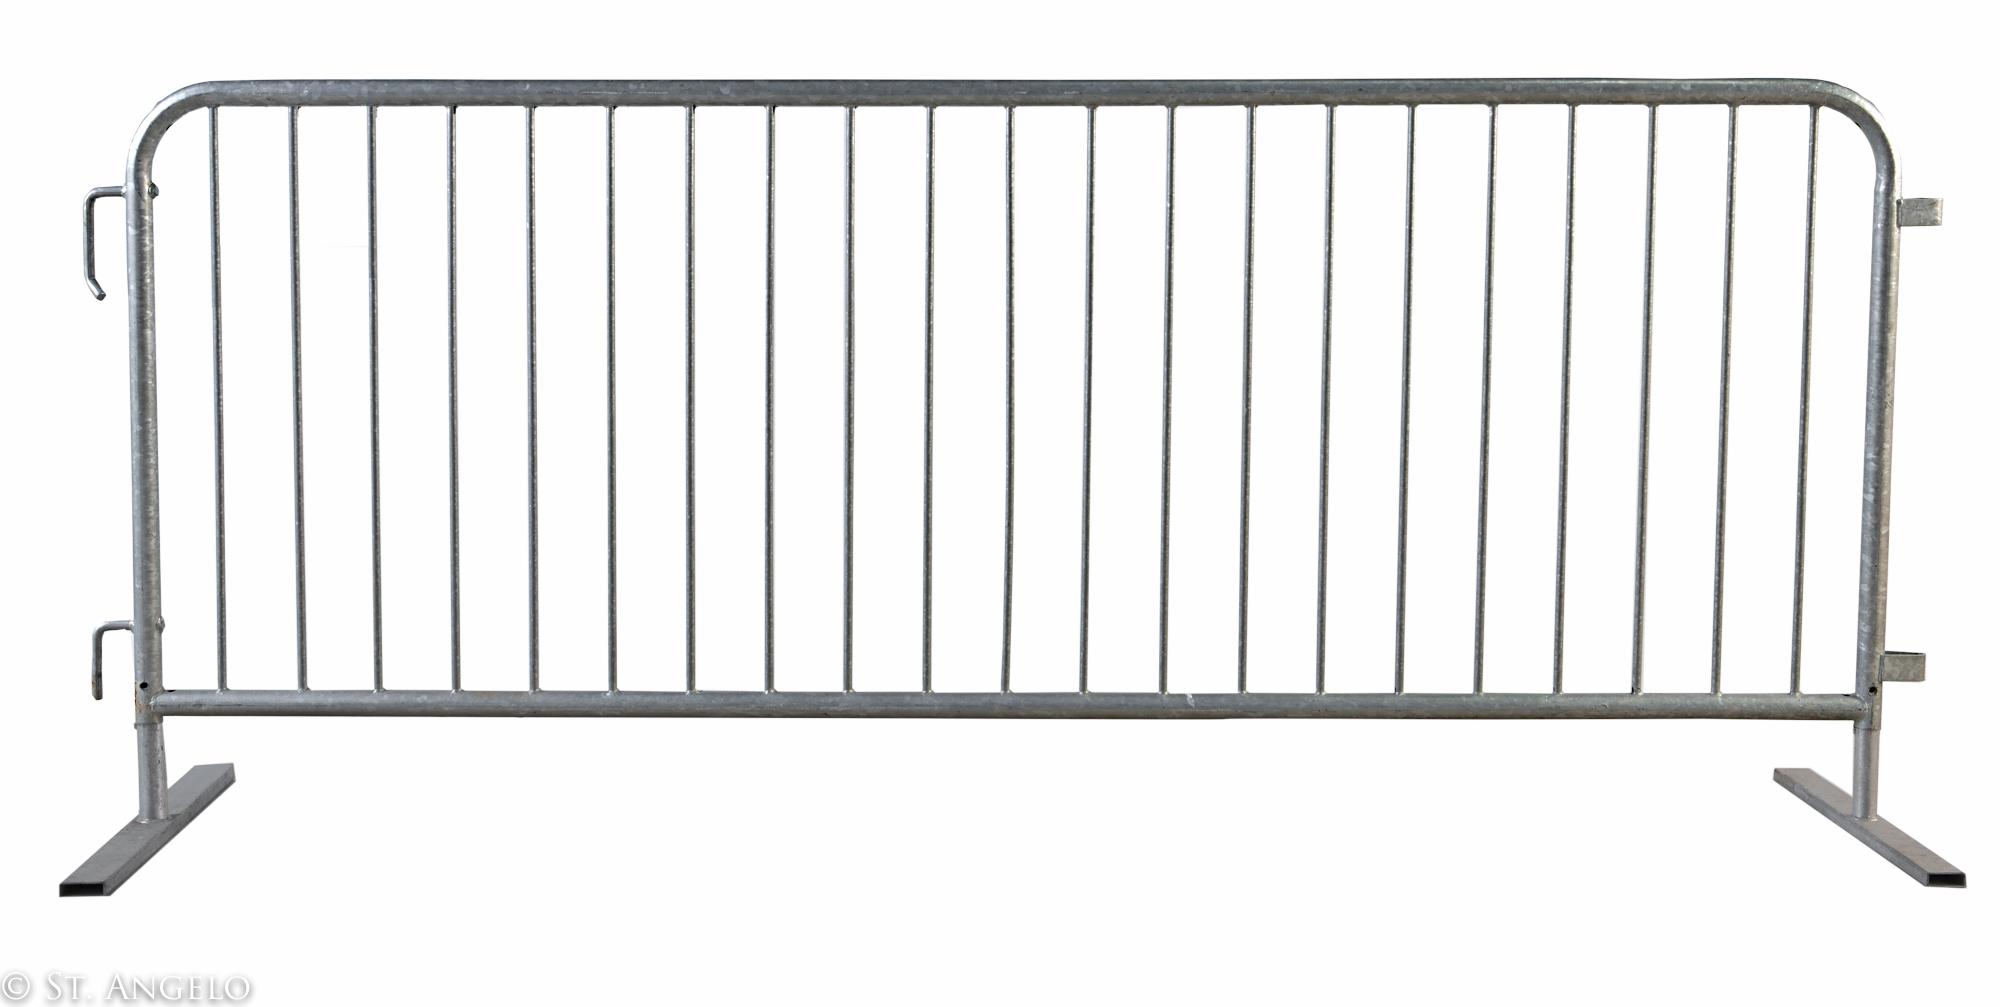 Barricade 3.0.3